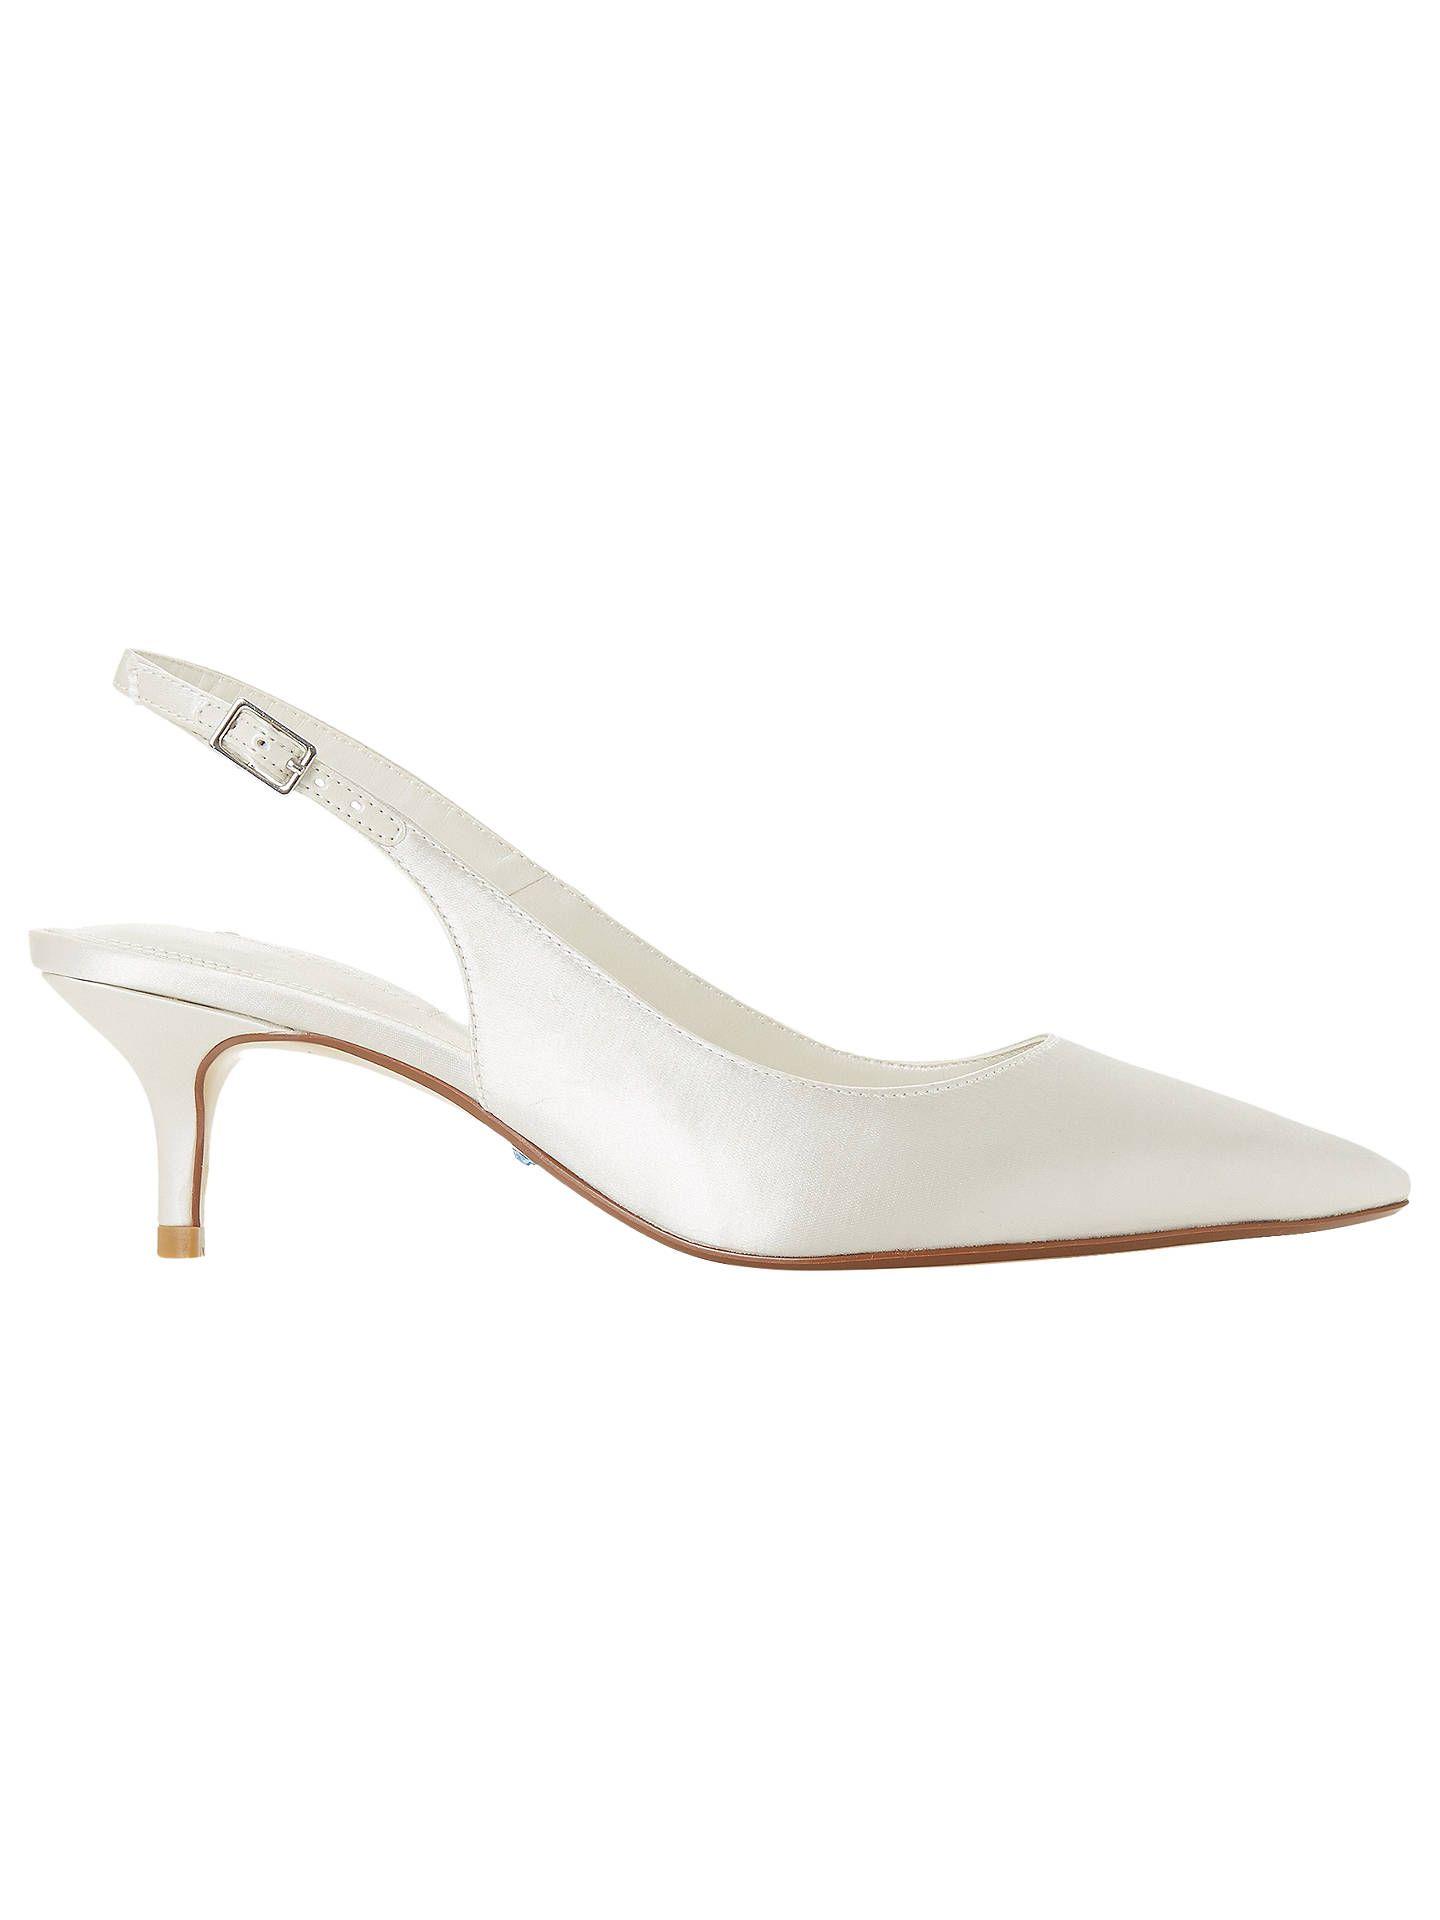 0dbed8c78a2 BuyDune Bridal Casandraa Kitten Heel Slingback Court Shoes